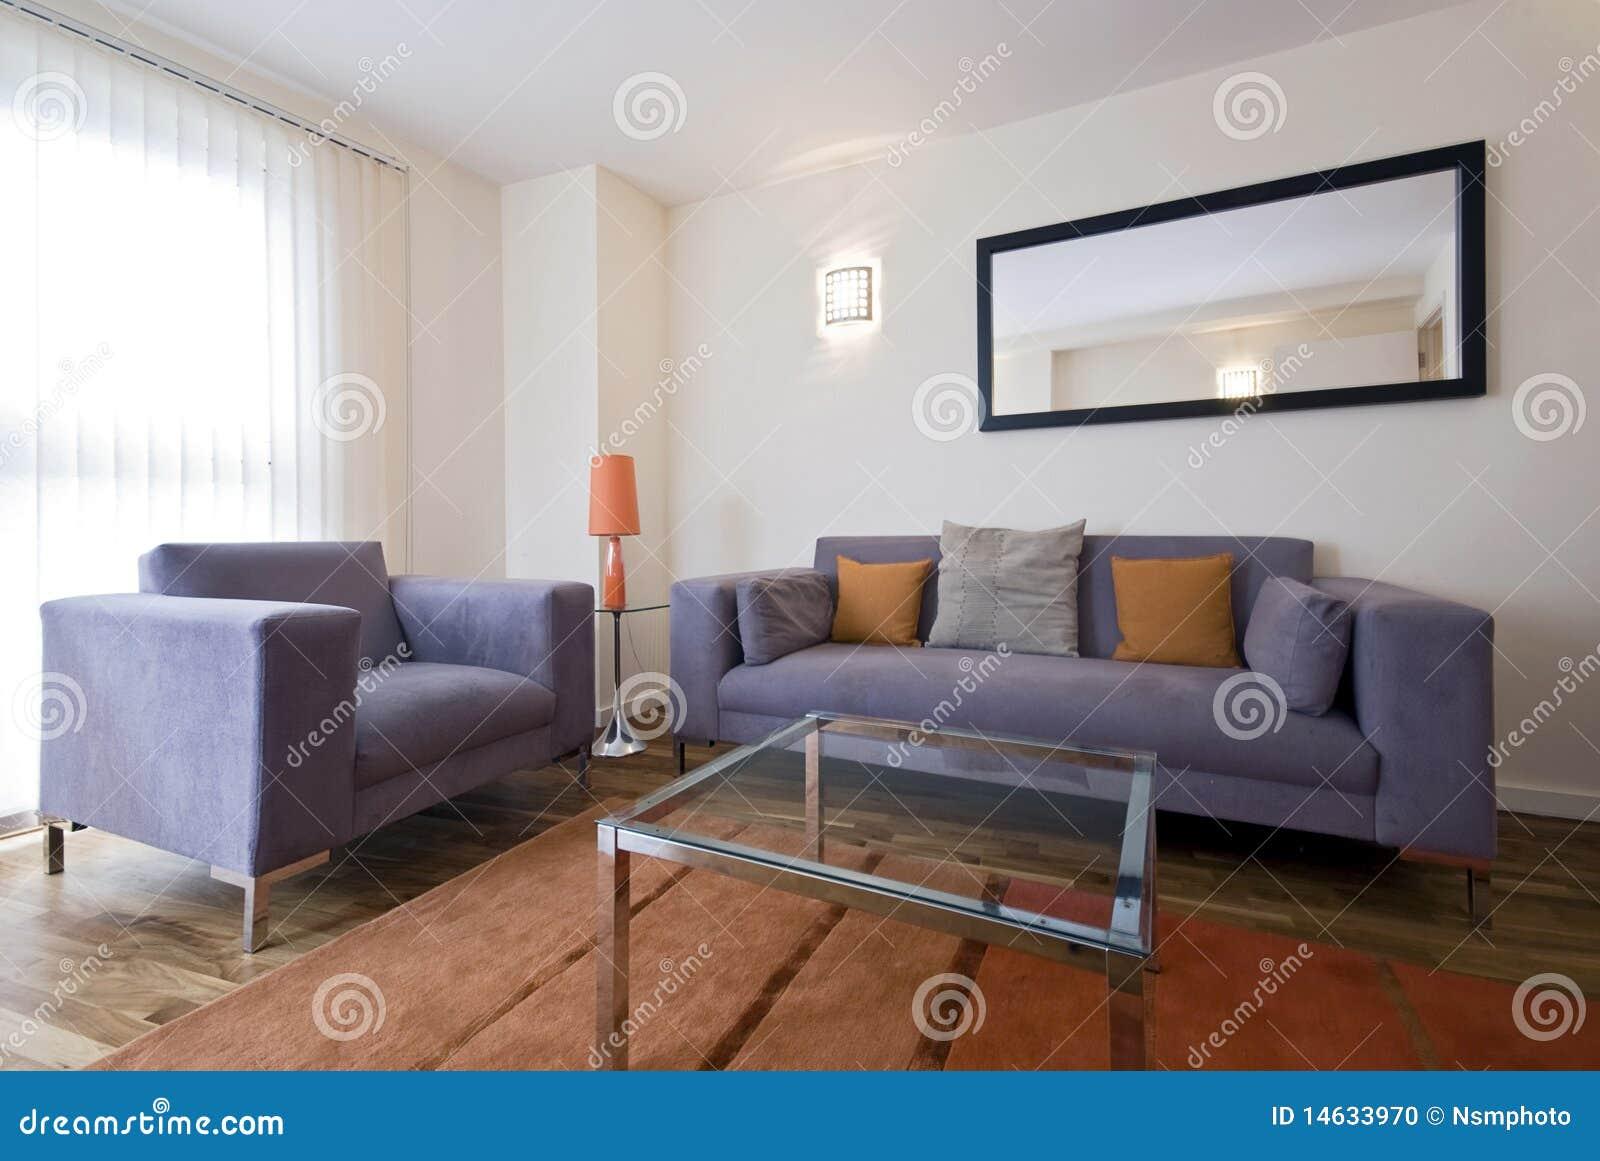 Wohnzimmer Graues Sofa – sehremini